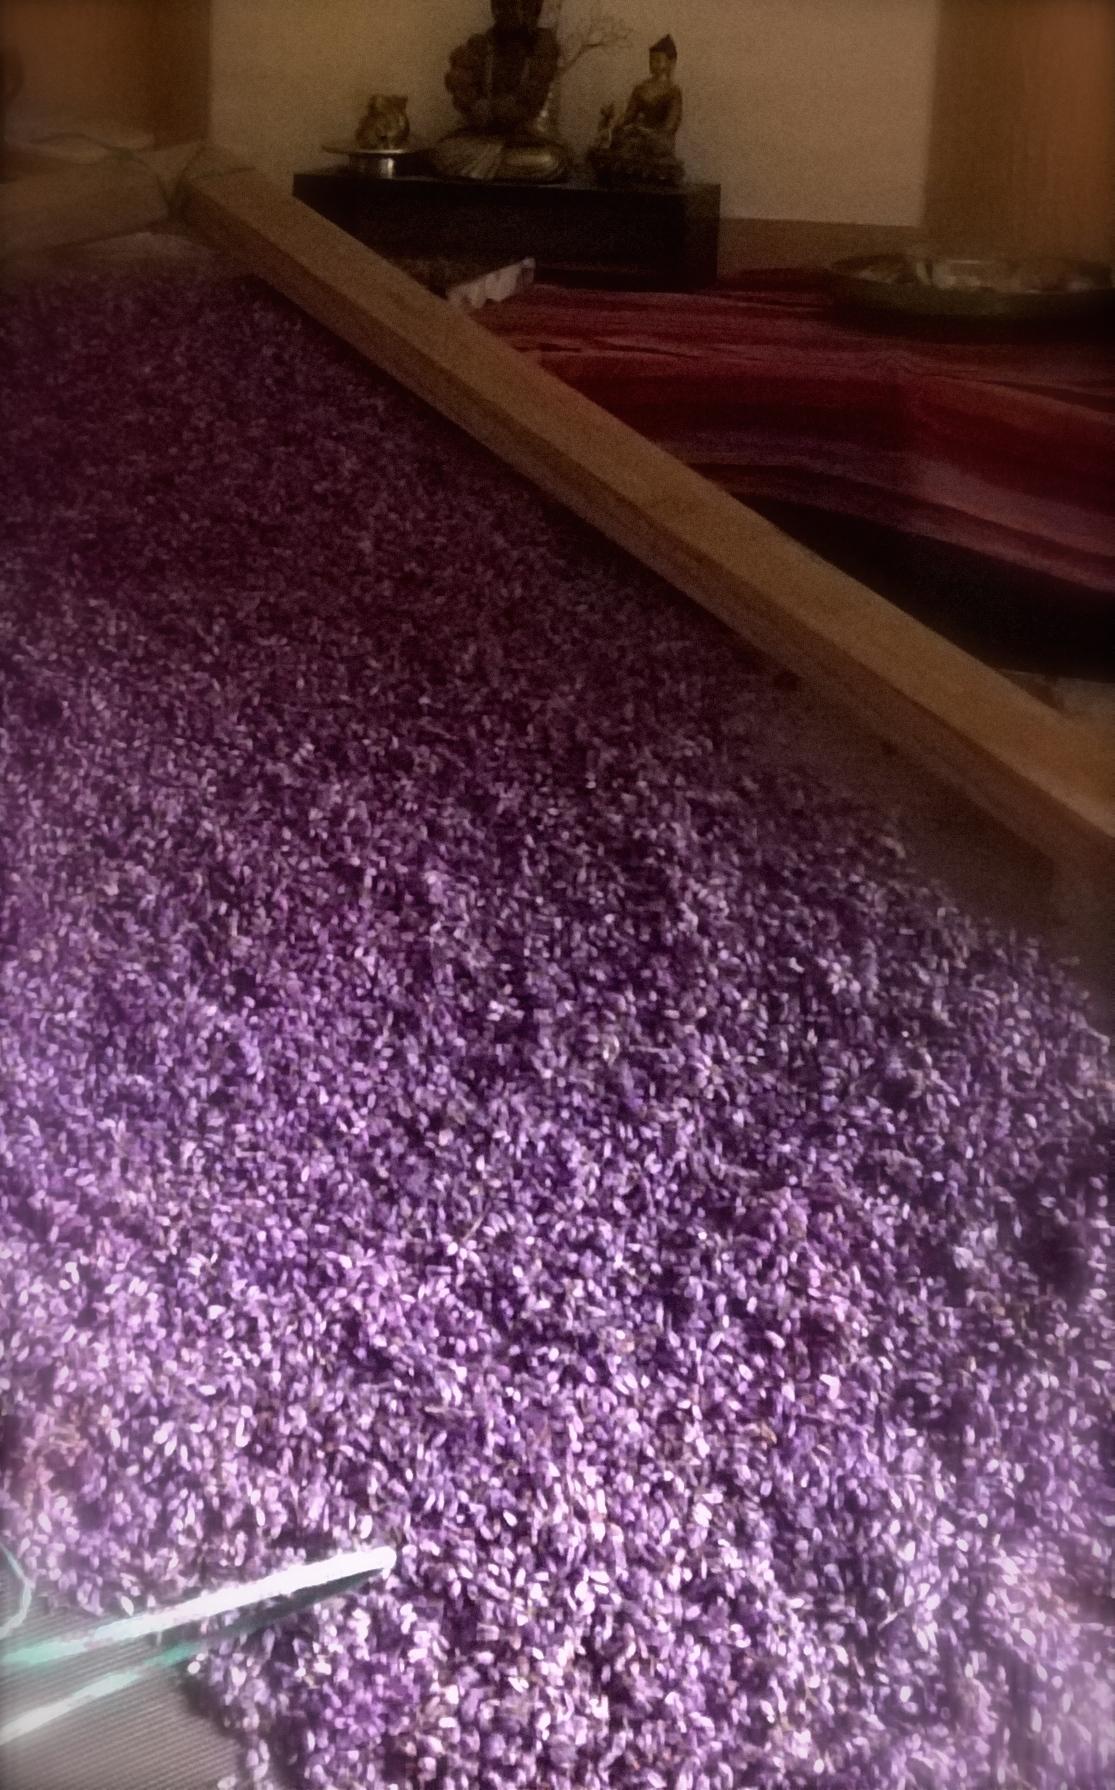 bruyère au séchage